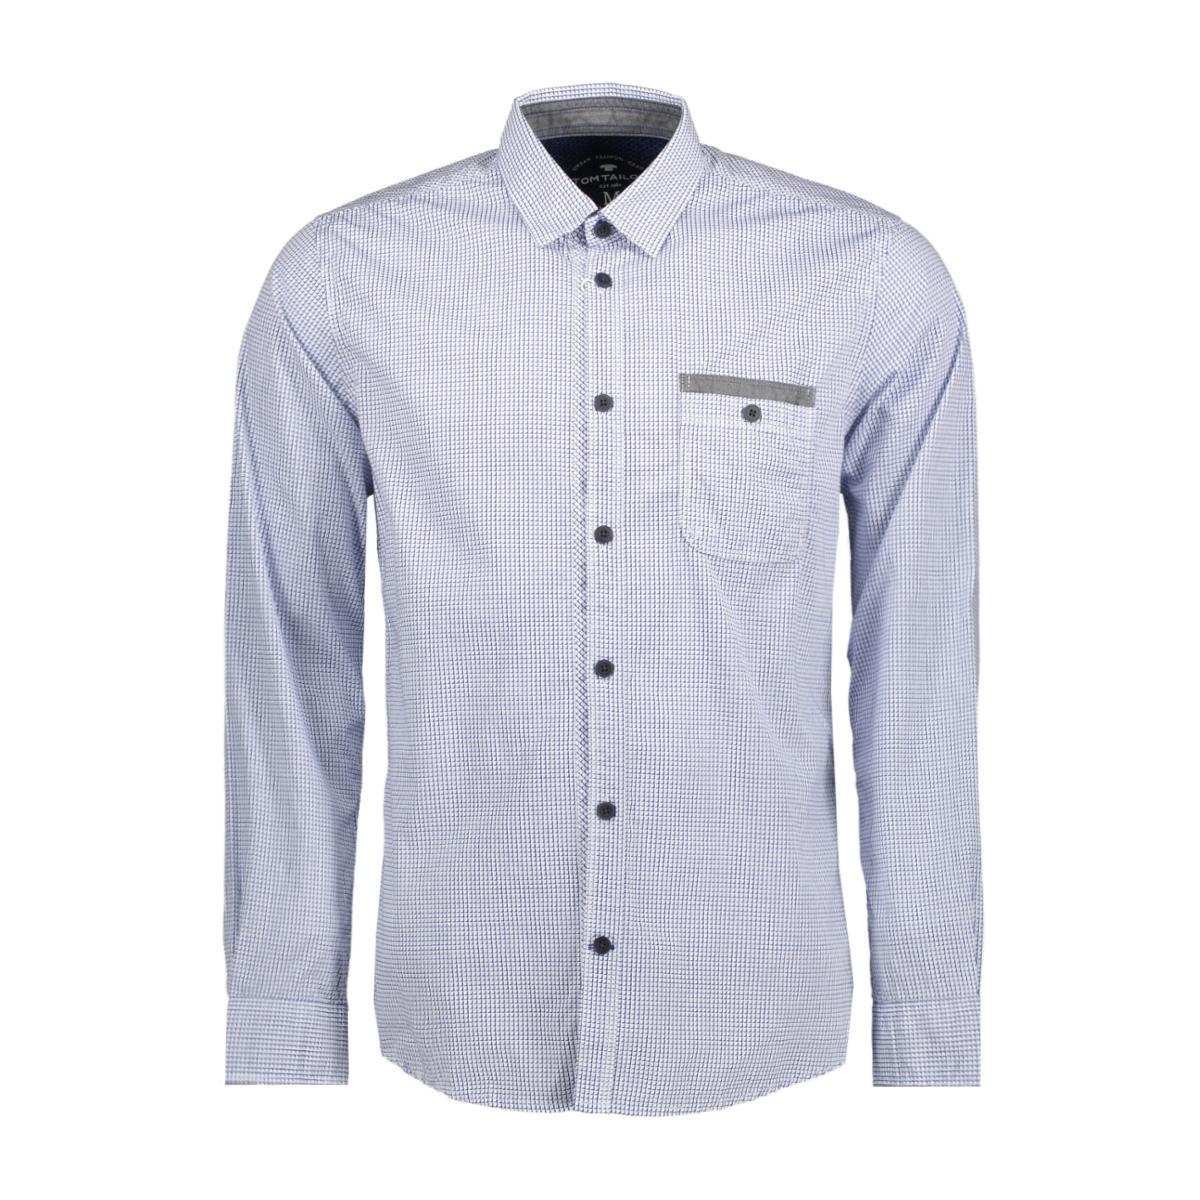 2033908.00.10 tom tailor overhemd 2000